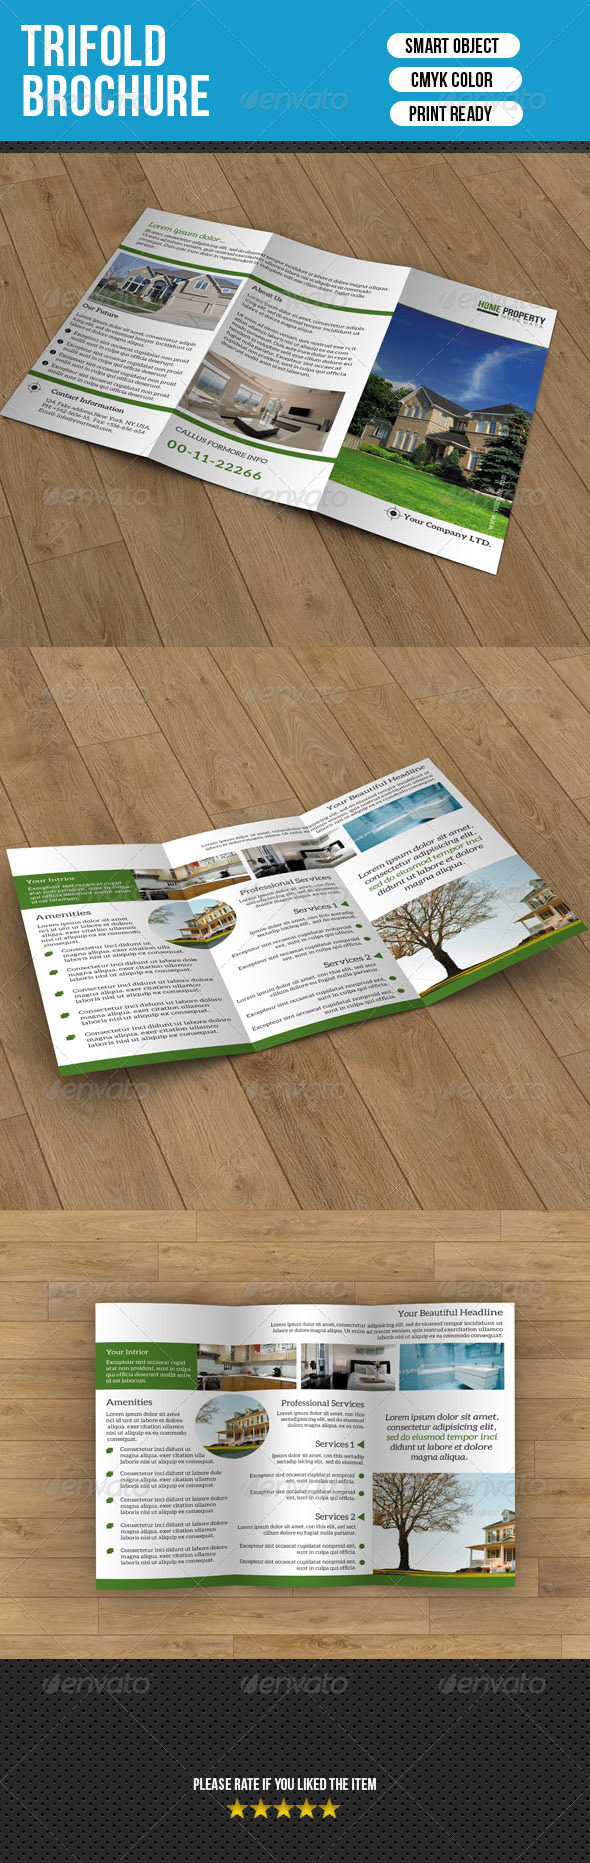 GraphicRiver Trifold Brochure- Real Estate 7050233